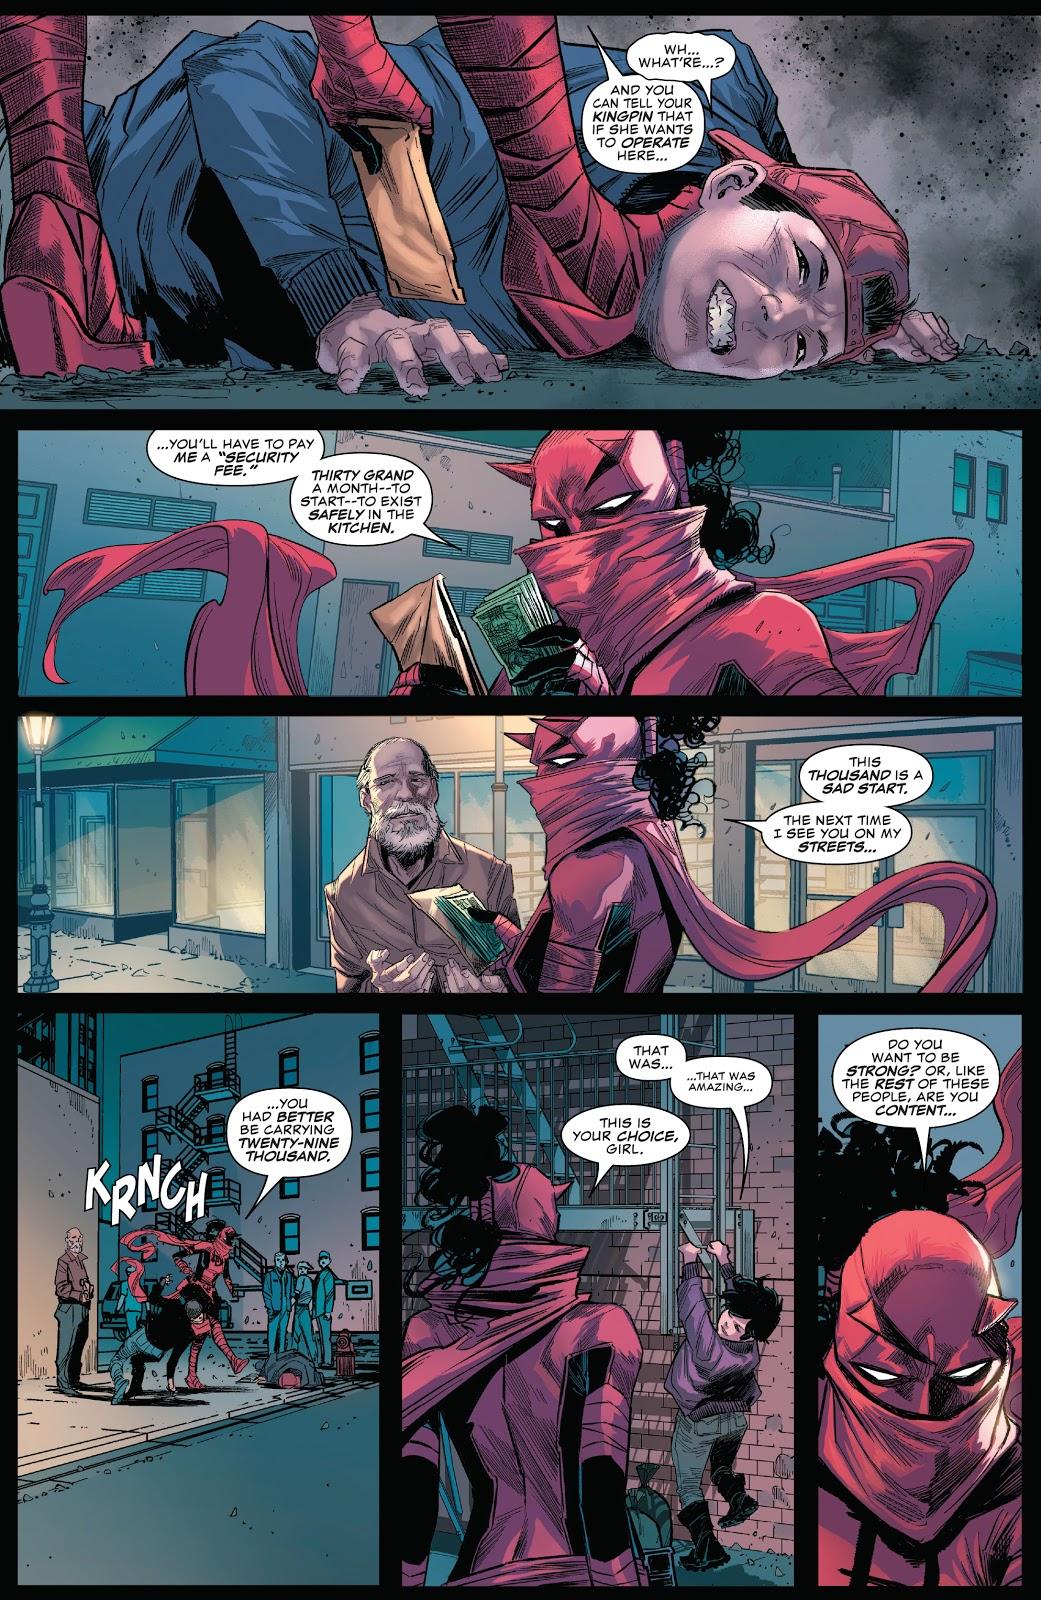 Daredevil (Elektra) Makes Hell's Kitchen Her Territory